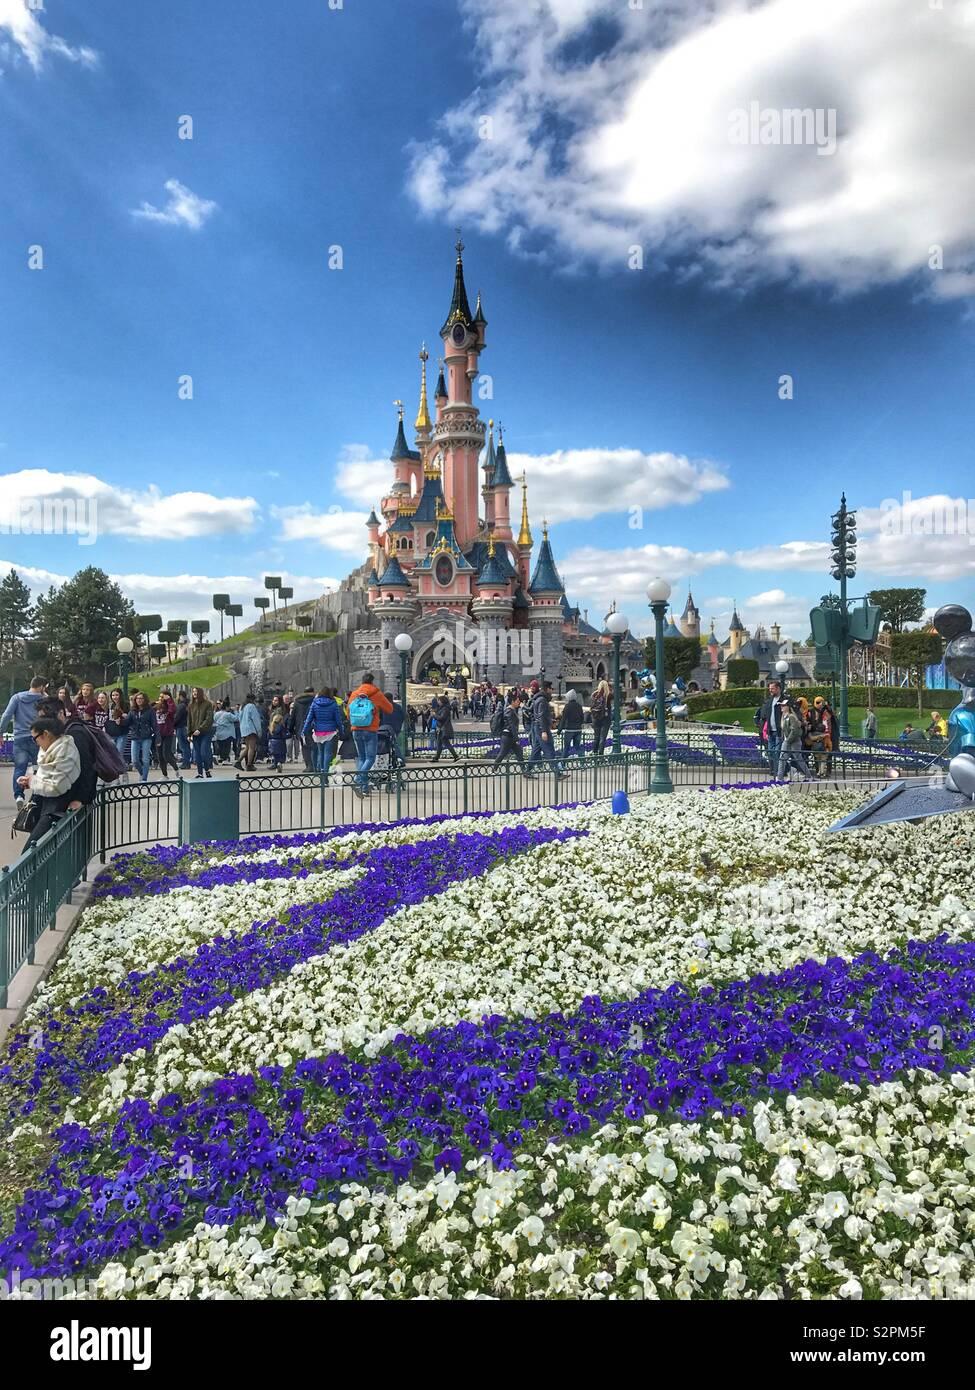 Sleeping beauty Castle - Fairy take castle Disney Land Paris France Stock Photo